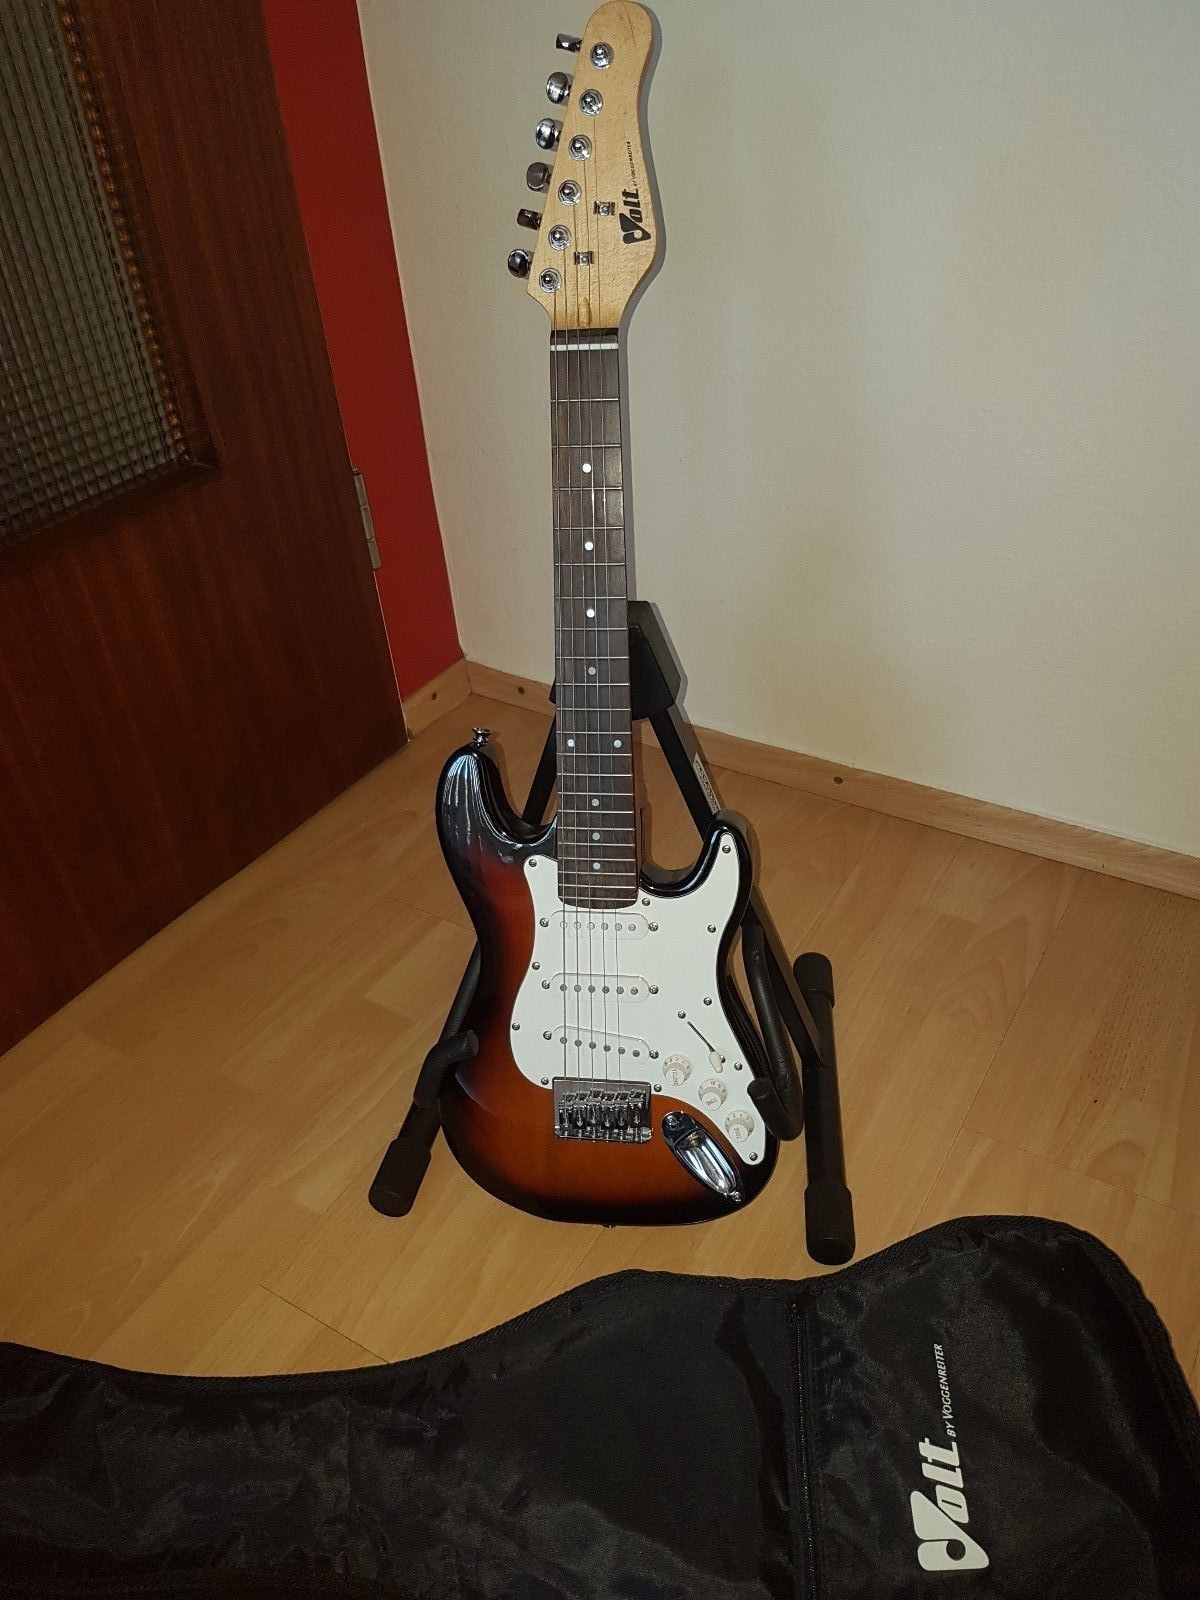 Kinder E Gitarre Volt By Voggenreiter Mit Tasche Von Volt By Voggenreitersparen25 Com Sparen25 De Sparen25 Info E Gitarre Gitarre Ebay